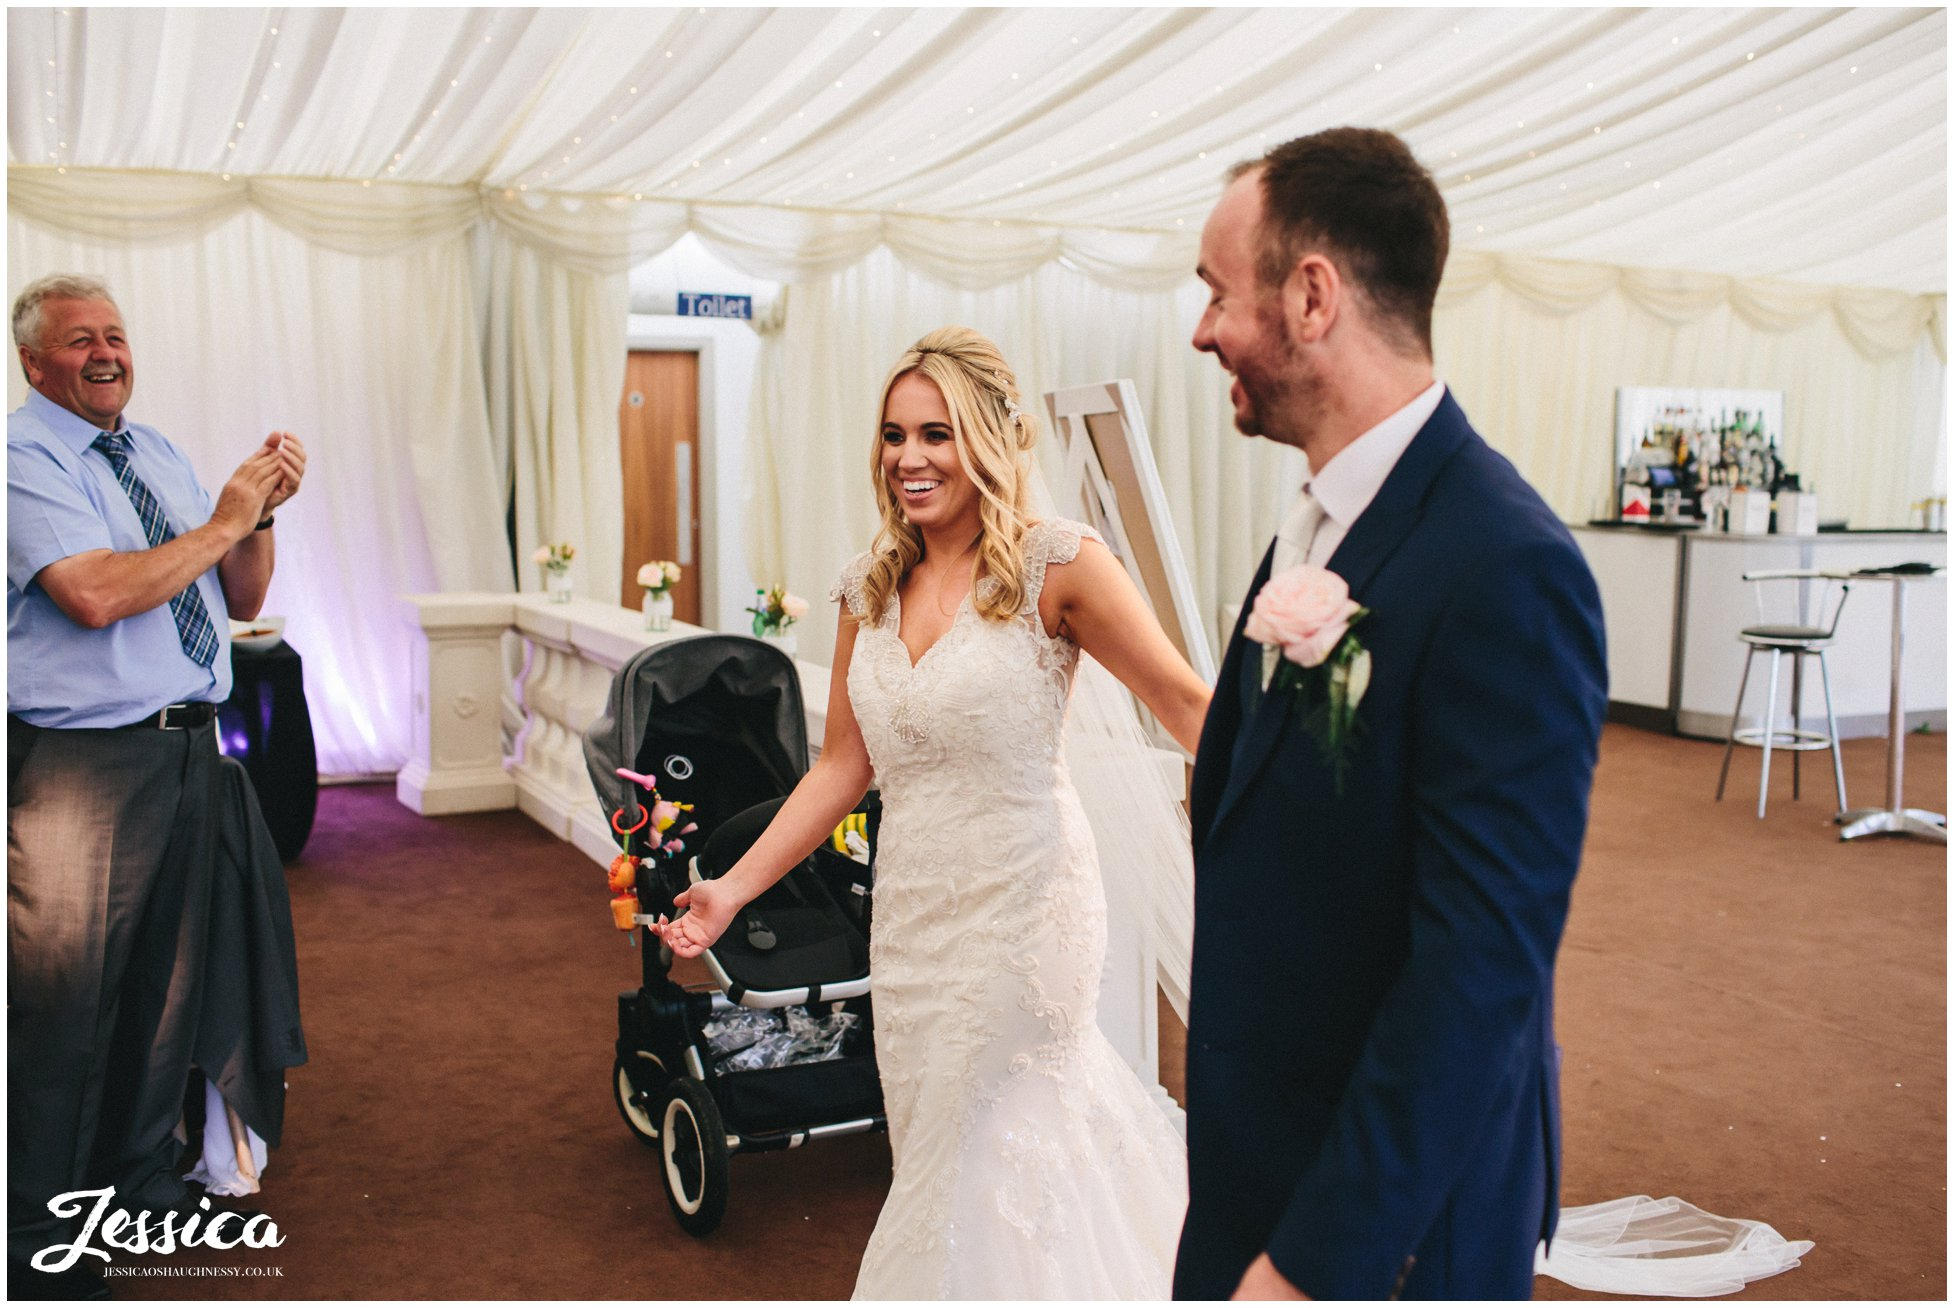 bride & groom announced into wedding room for their wedding breakfast